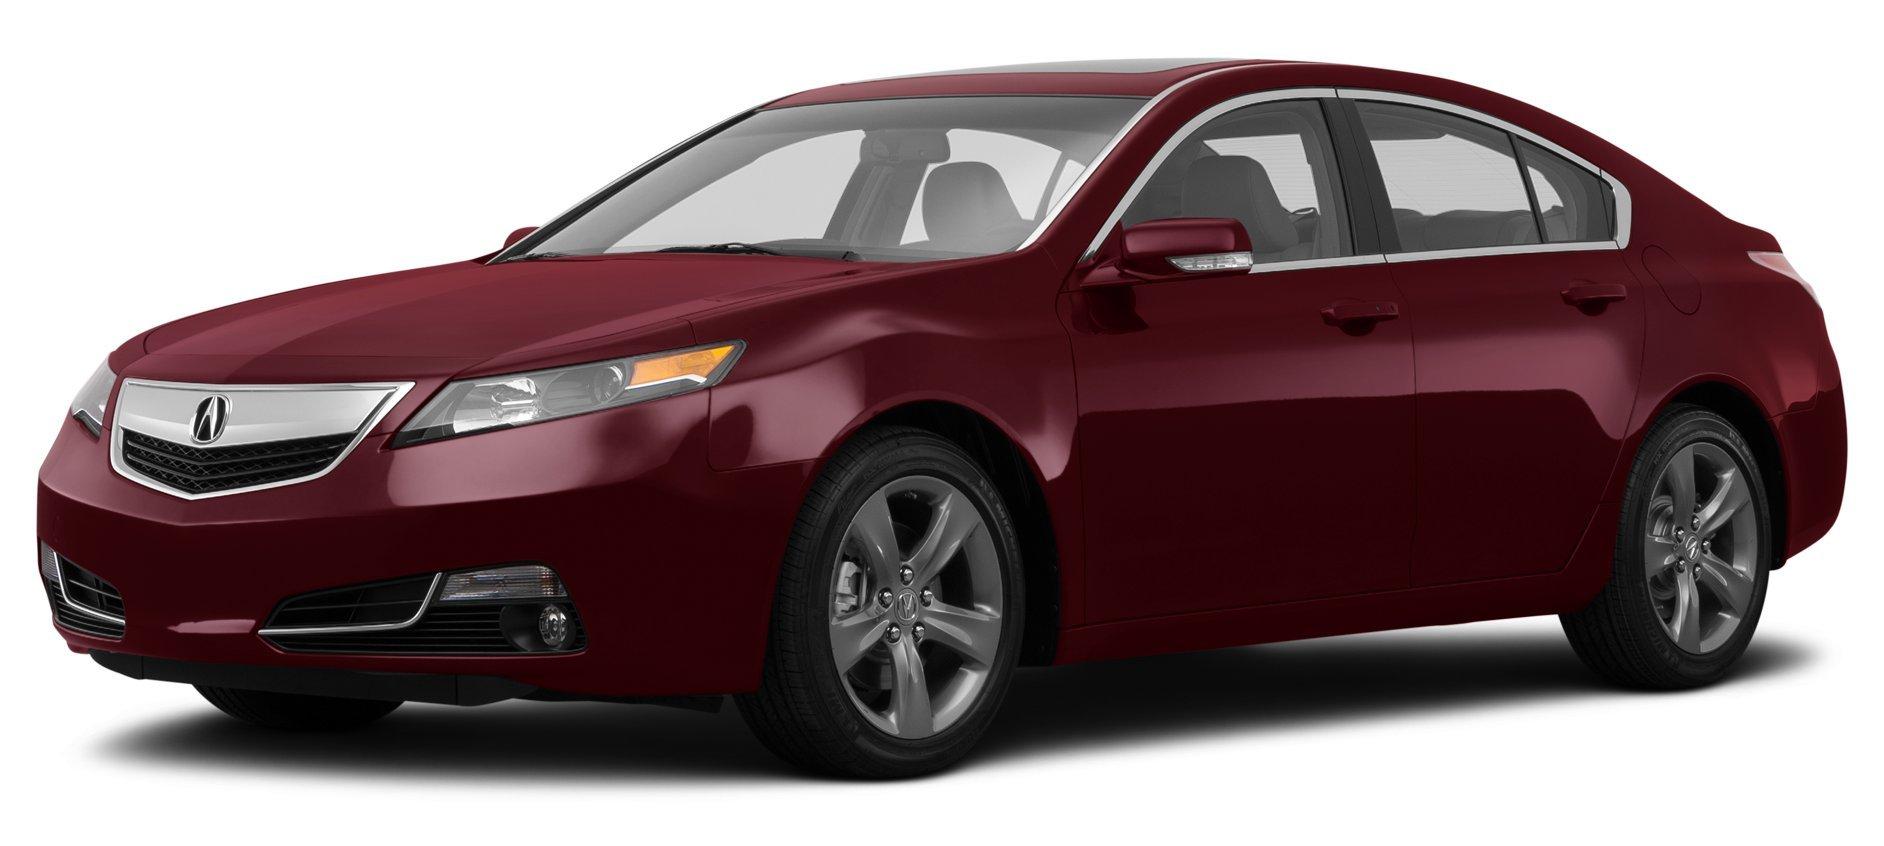 ... 2014 Acura TL Advance, 4-Door Sedan Automatic Transmission 2-Wheel Drive ...